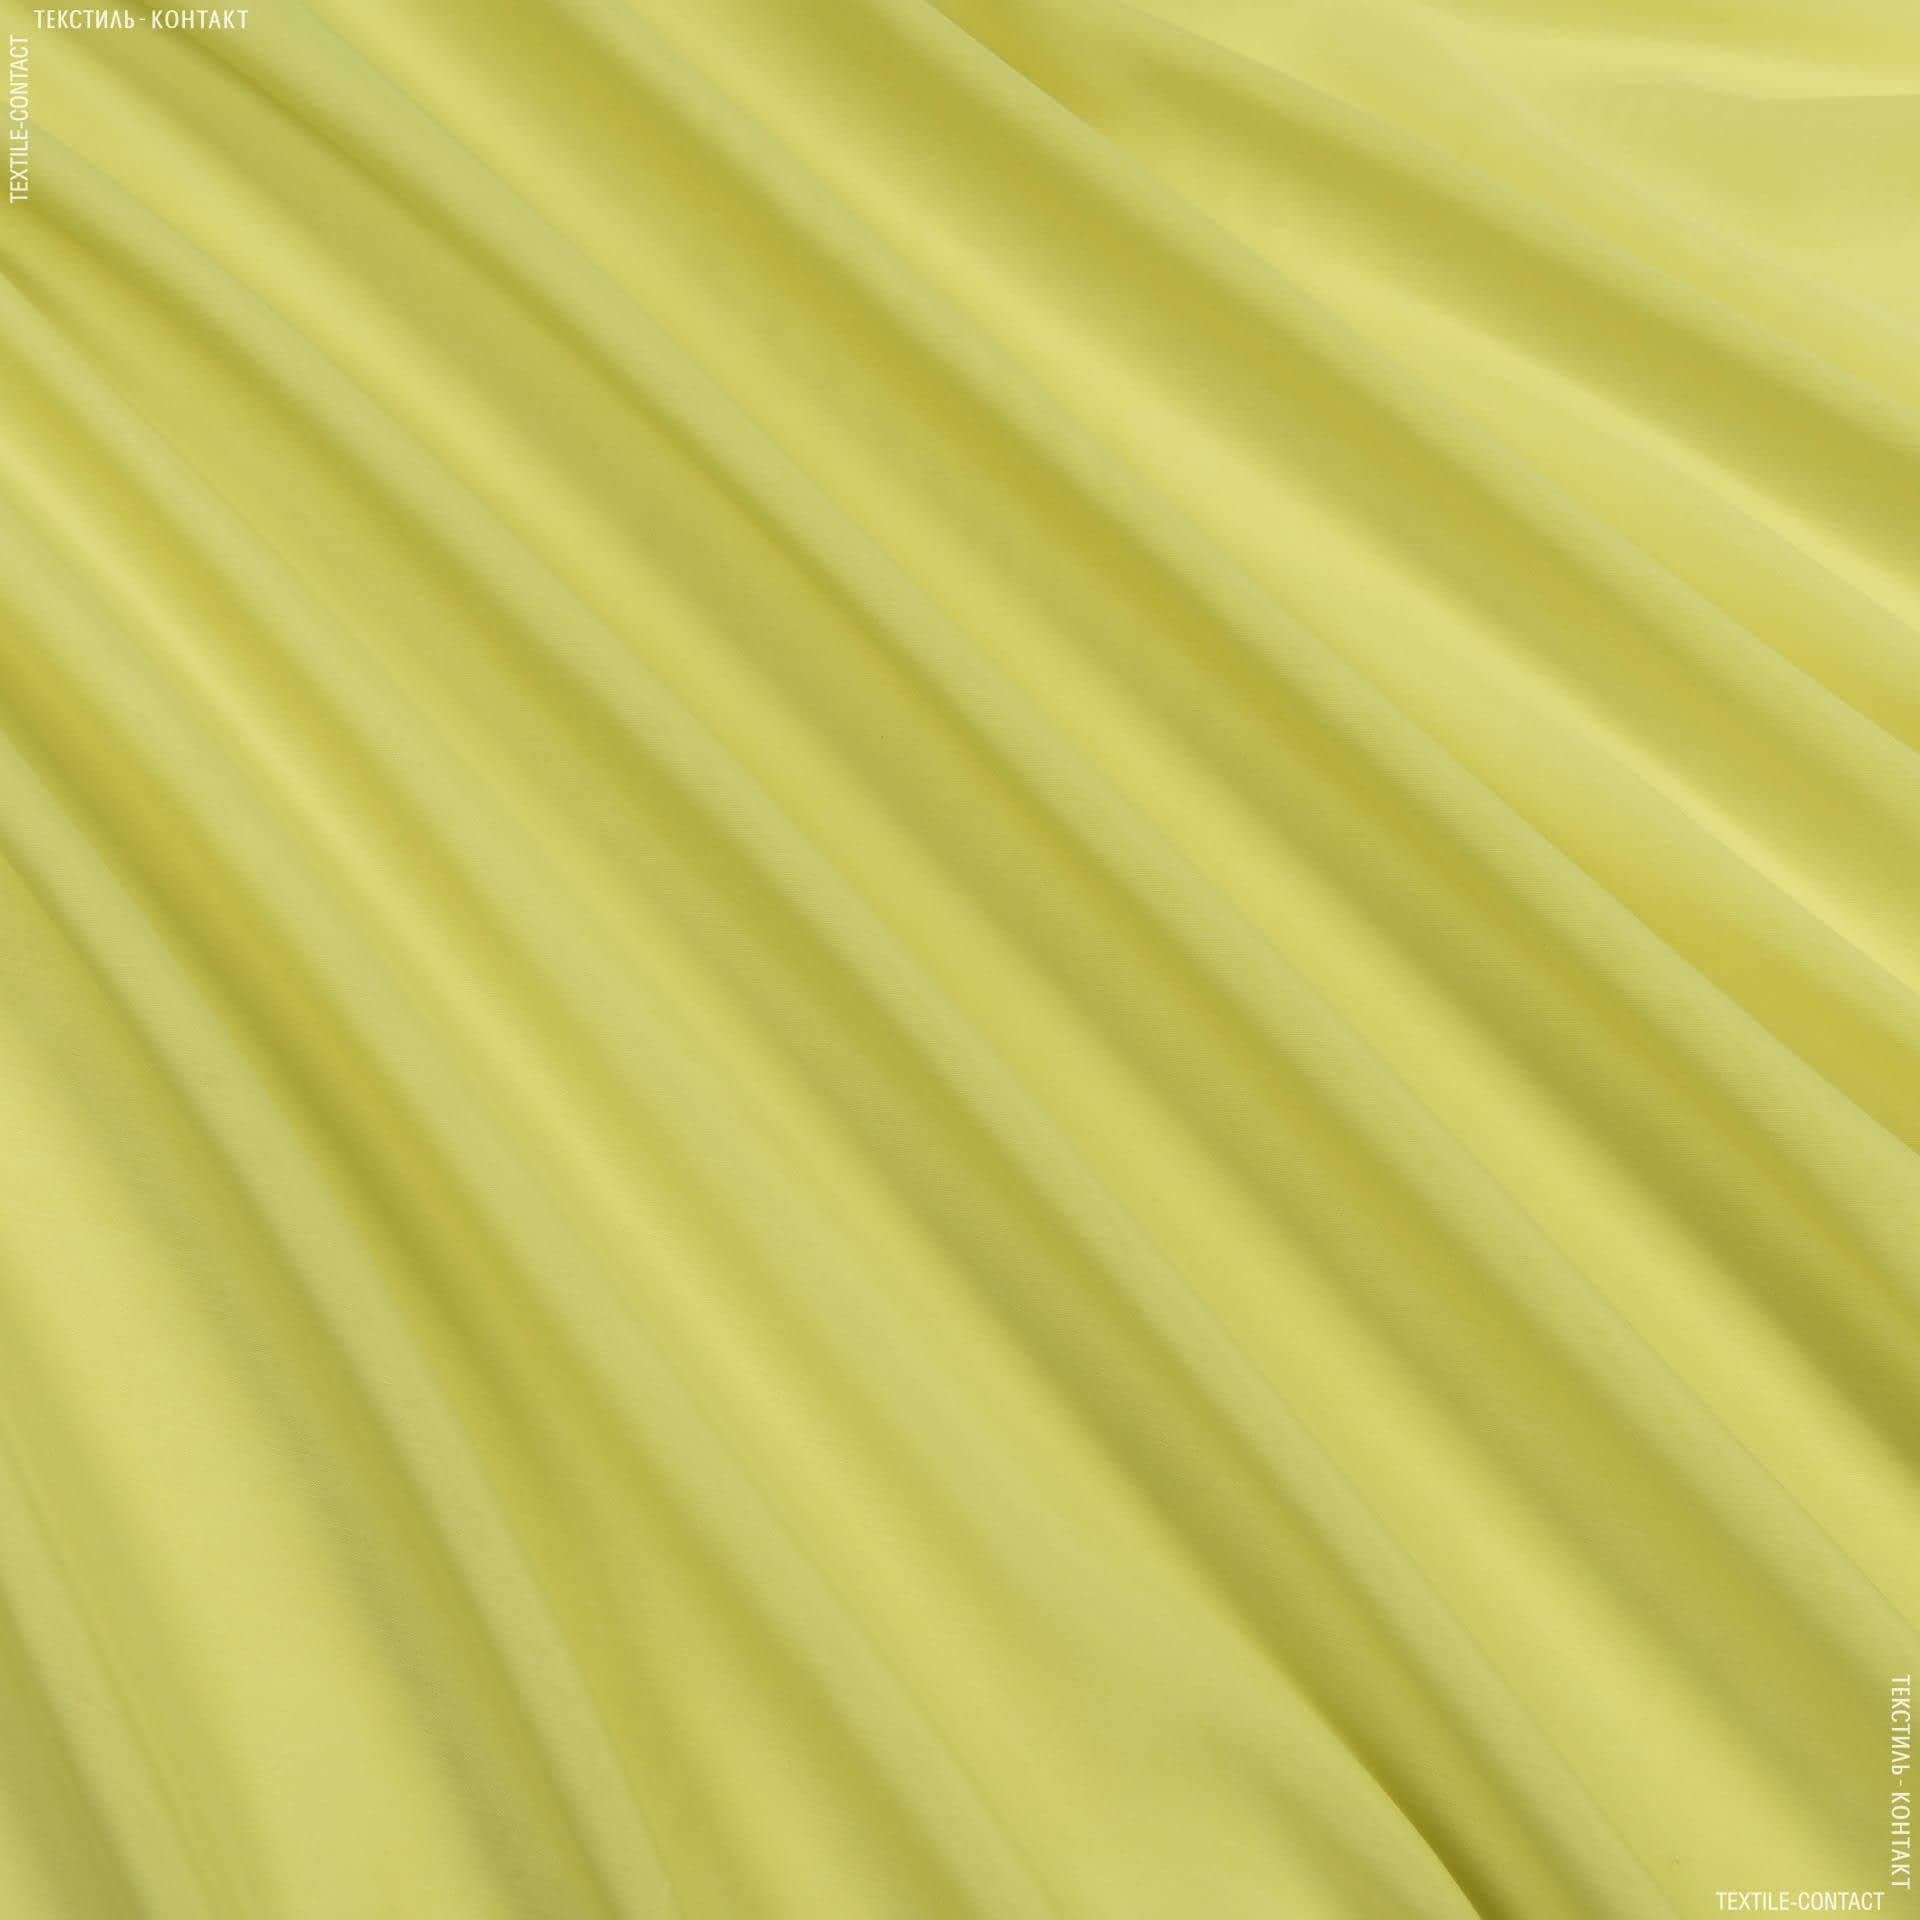 Ткани гардинные ткани - Тюль батист  морела   фисташка